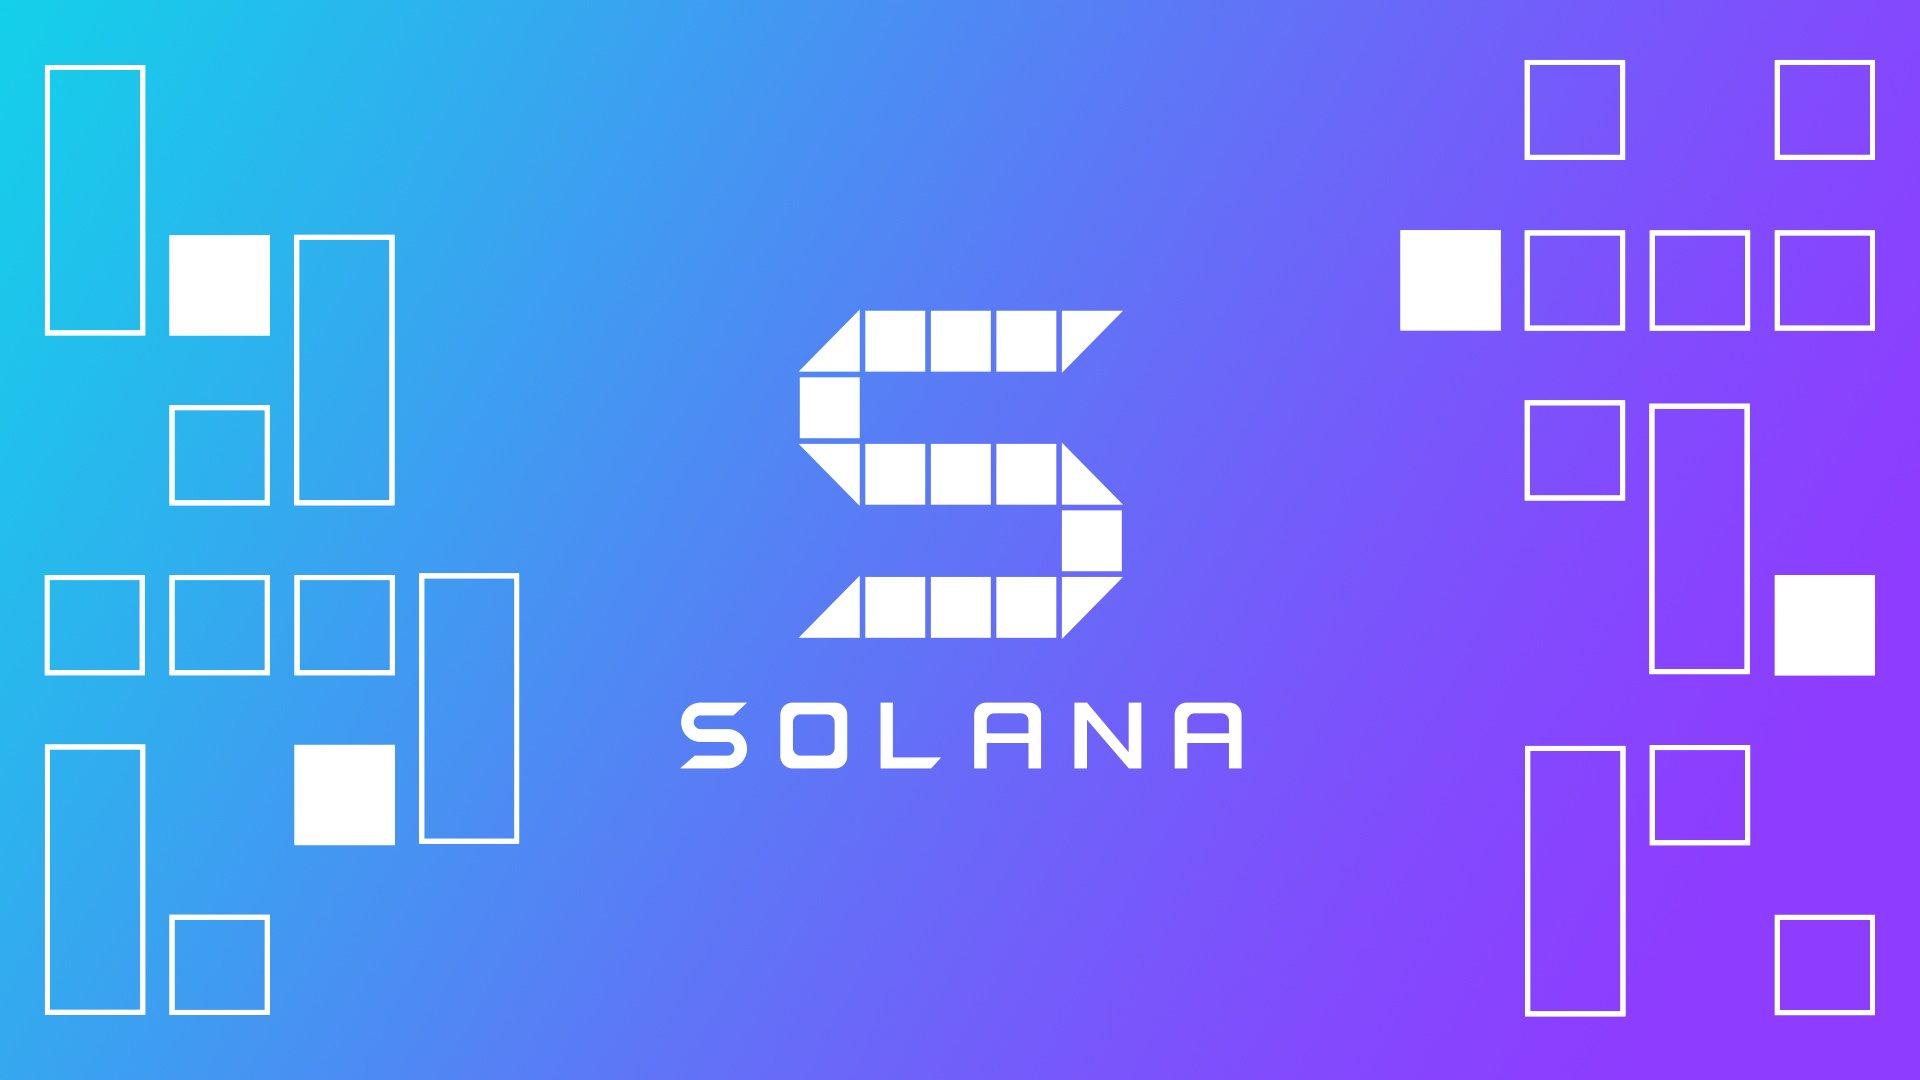 Solana-based NFT auction protocol Burnt Finance raises $3 million in seed funding